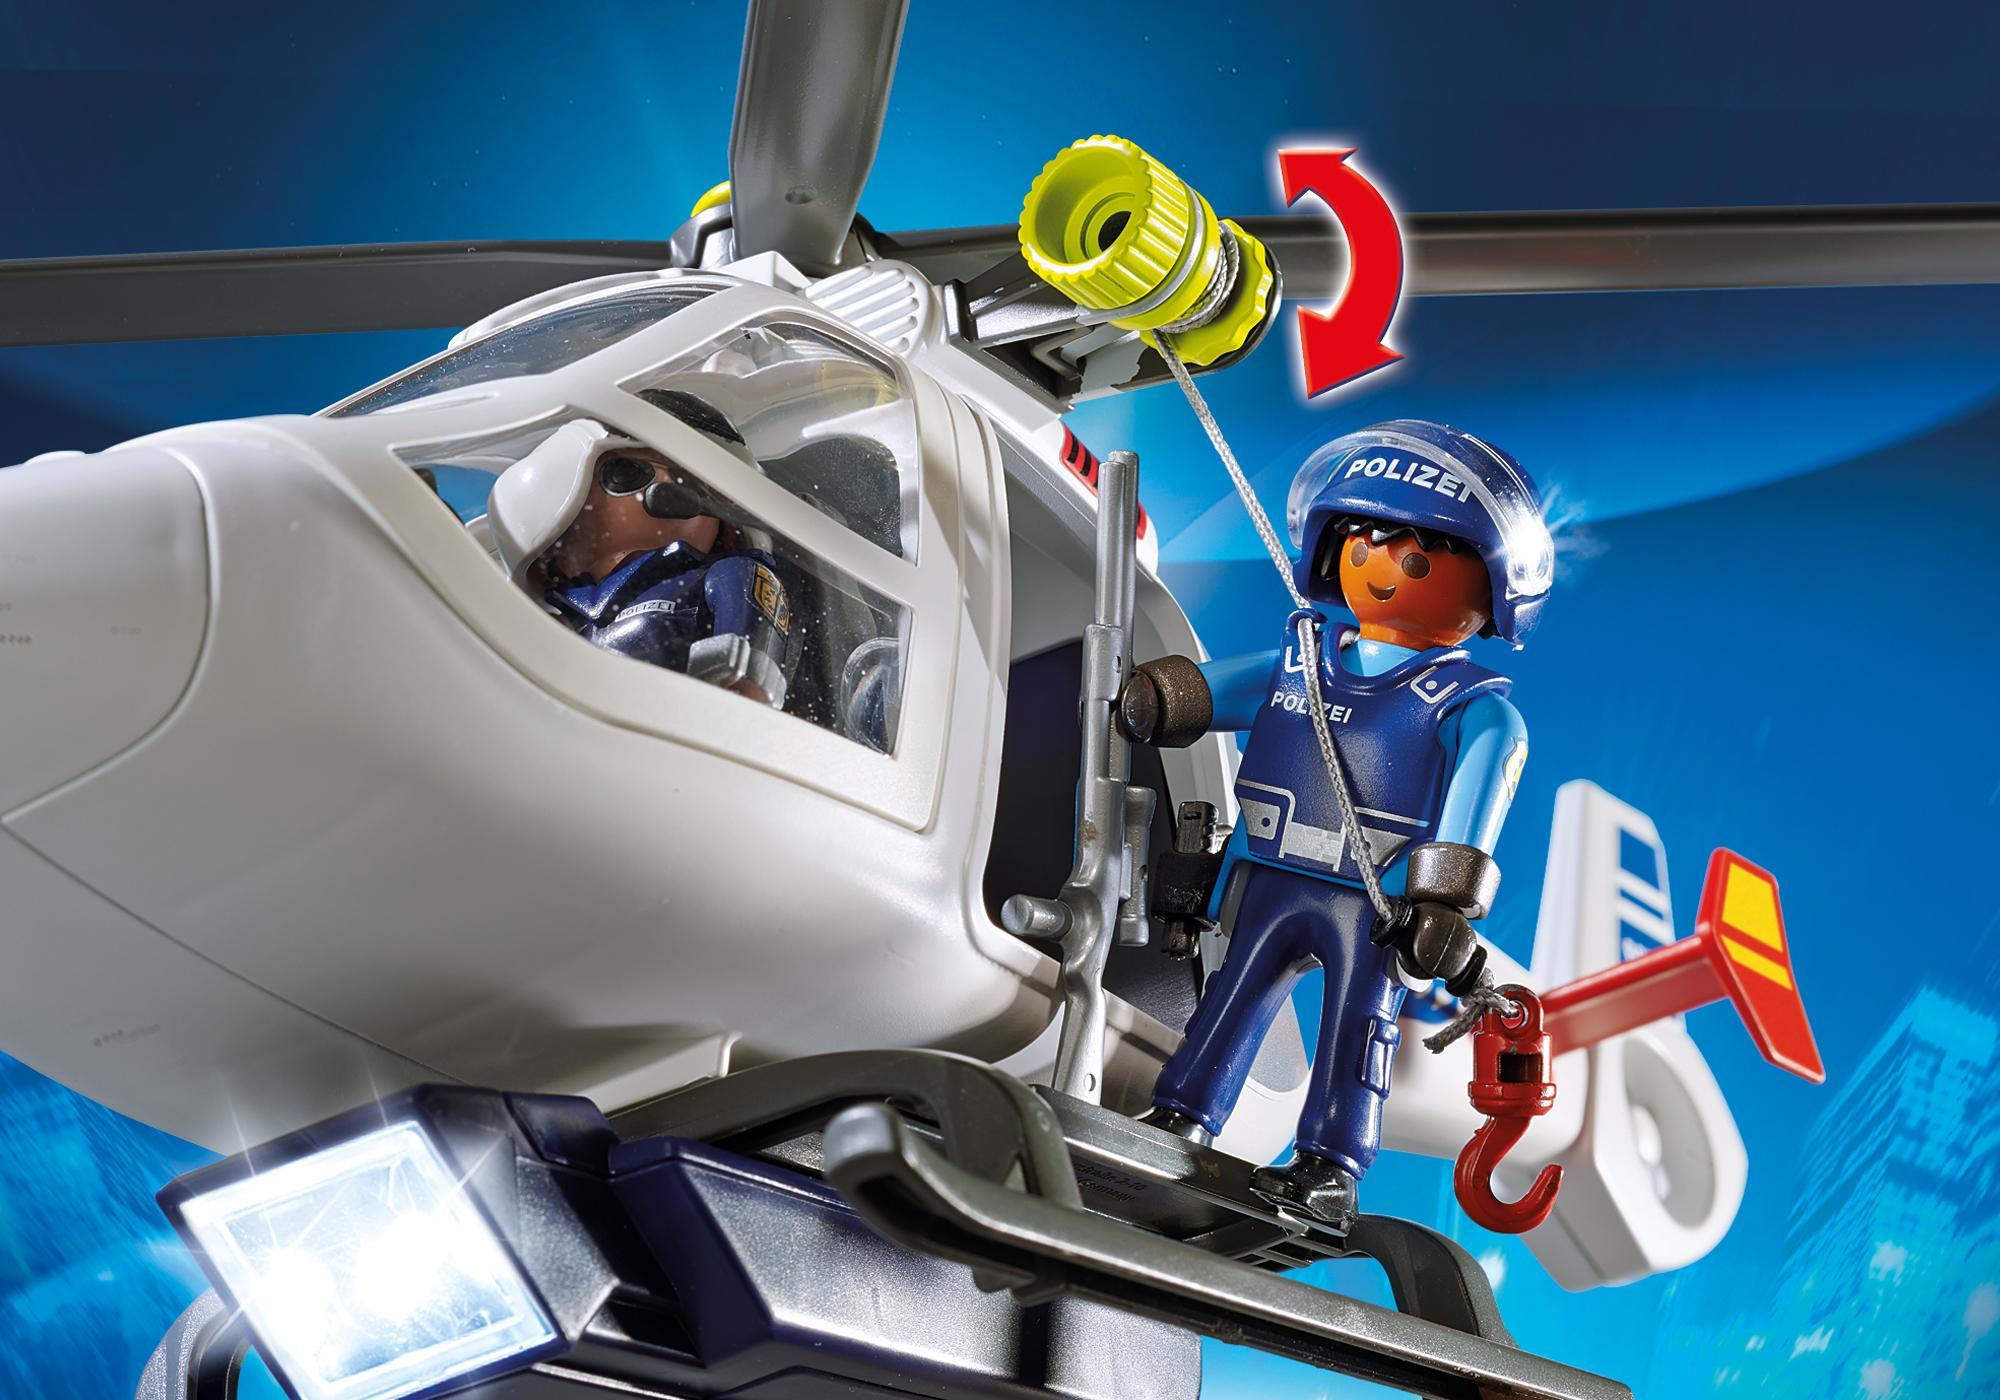 http://media.playmobil.com/i/playmobil/6874_product_extra2/Polizei-Helikopter mit LED-Suchscheinwerfer